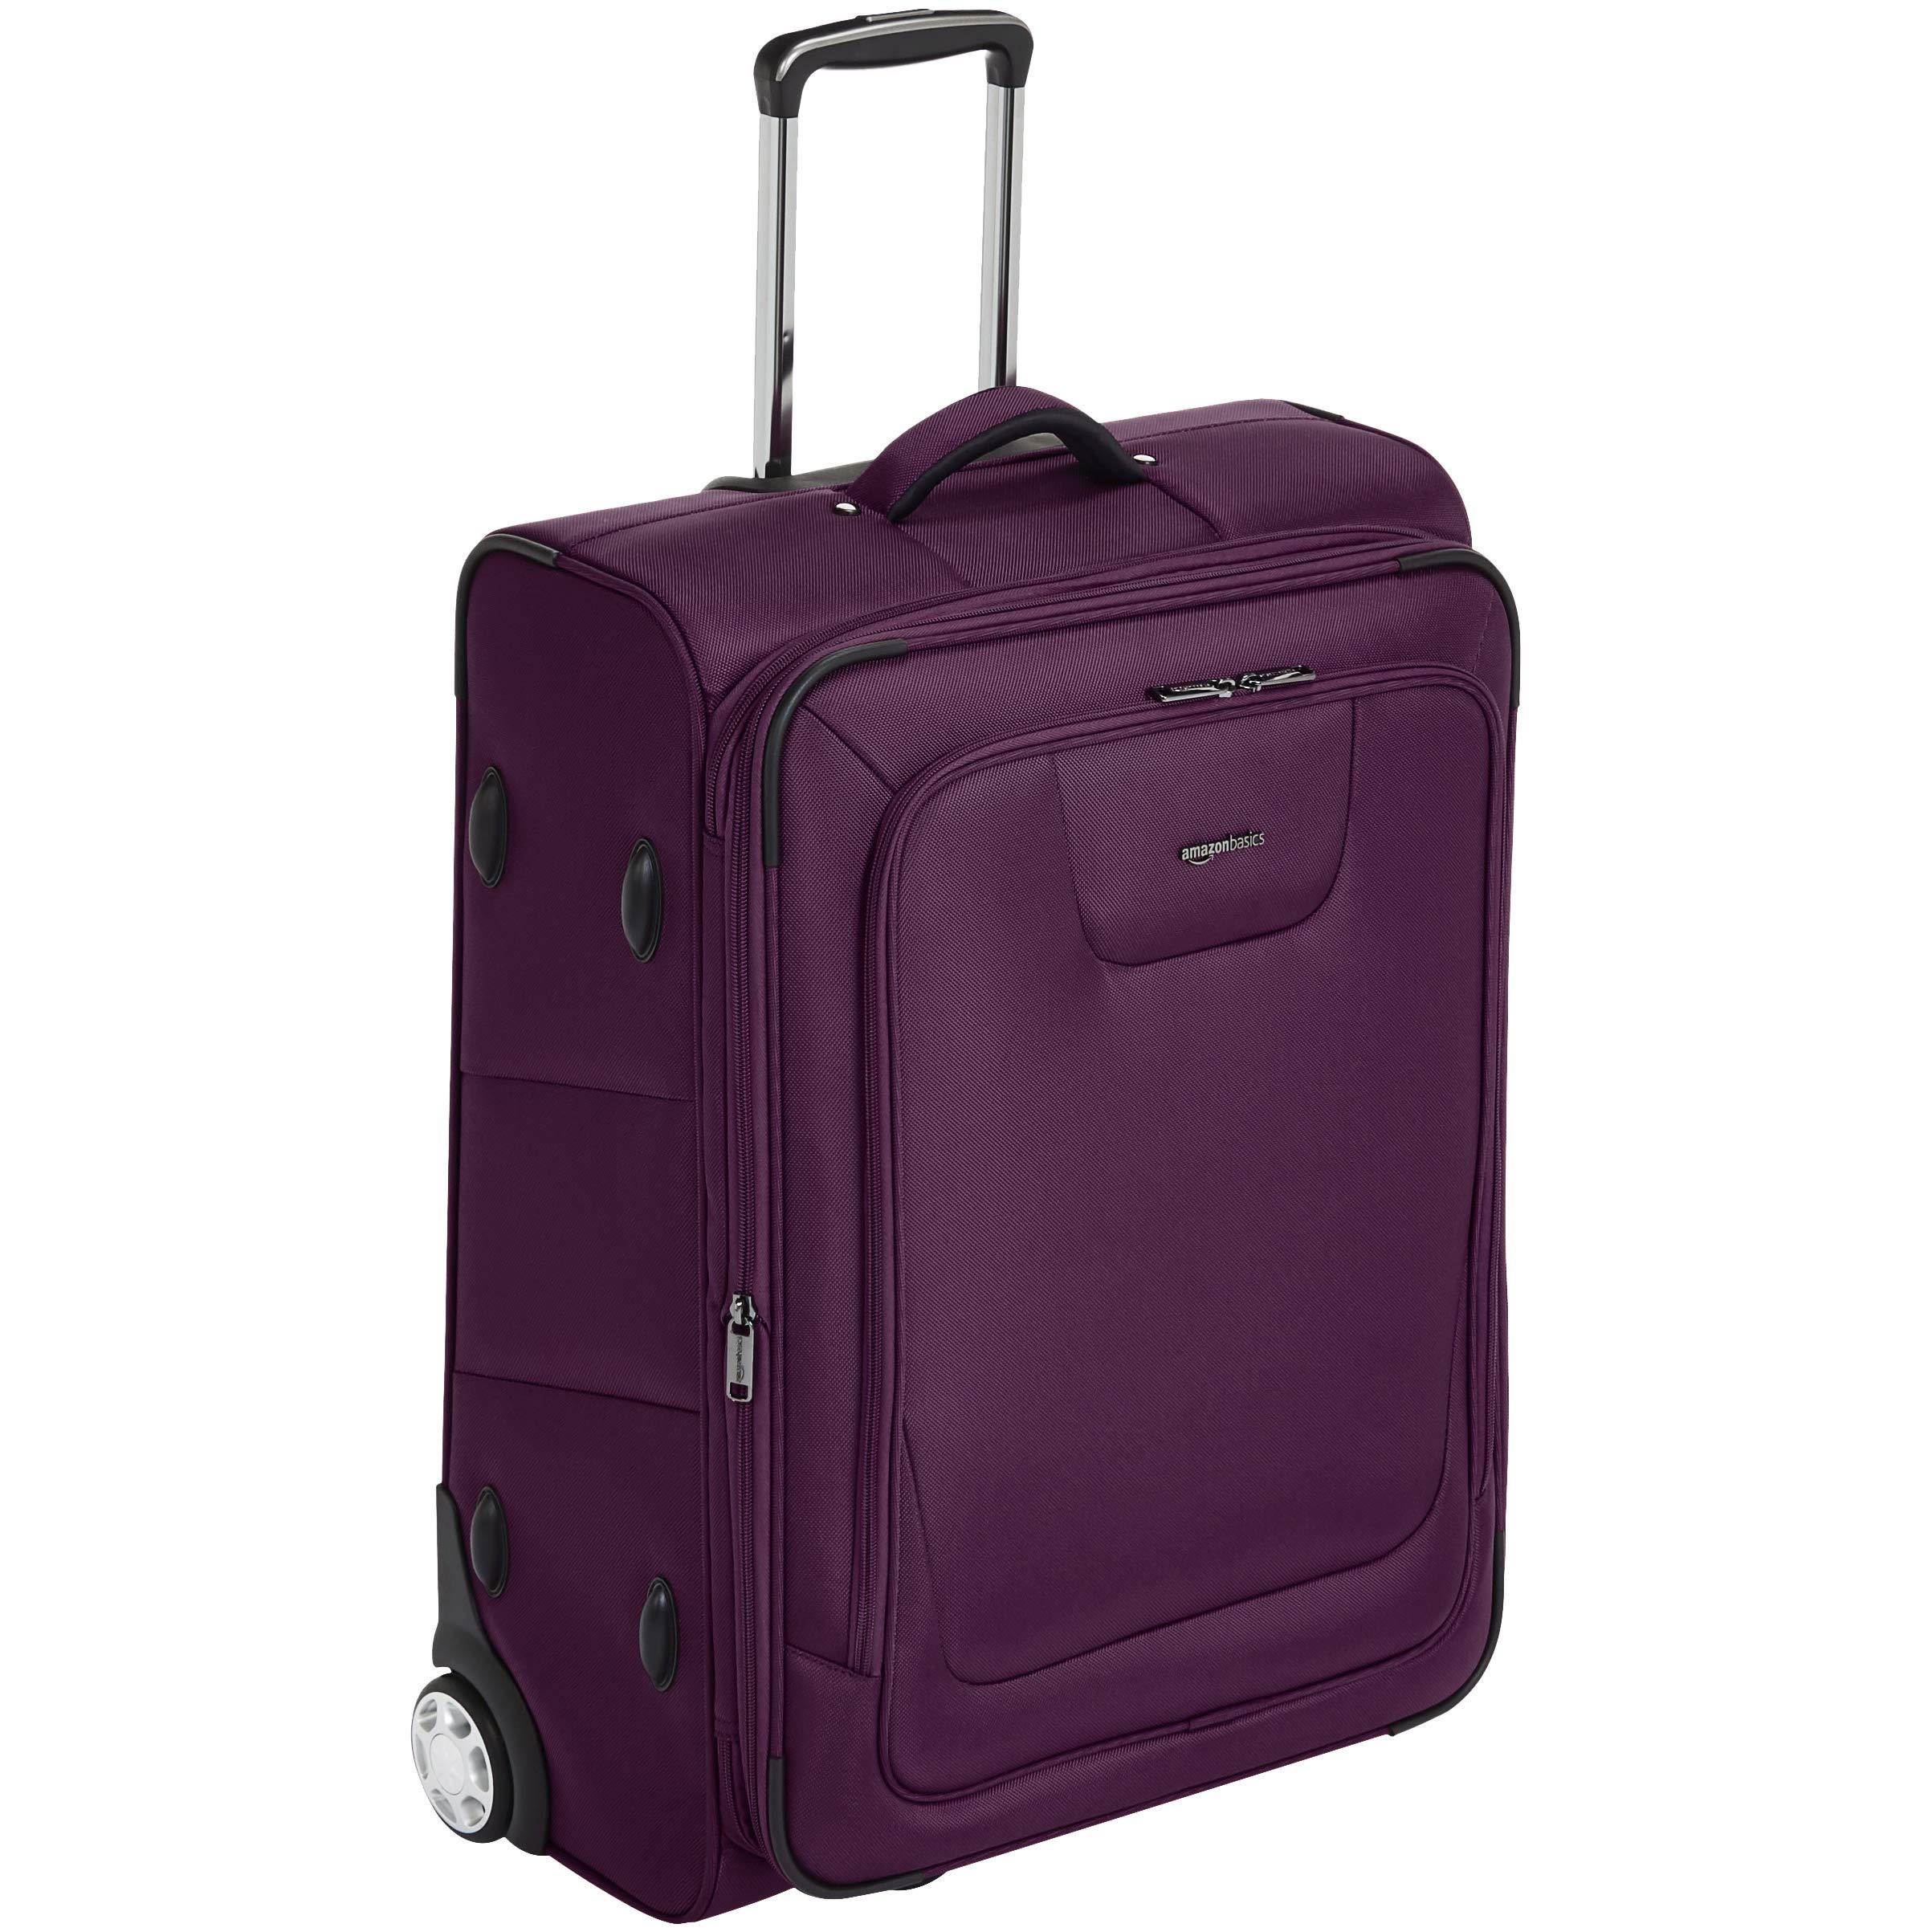 AmazonBasics Expandable Softside Rolling Luggage Suitcase With TSA Lock And Wheels - 26 Inch, Purple